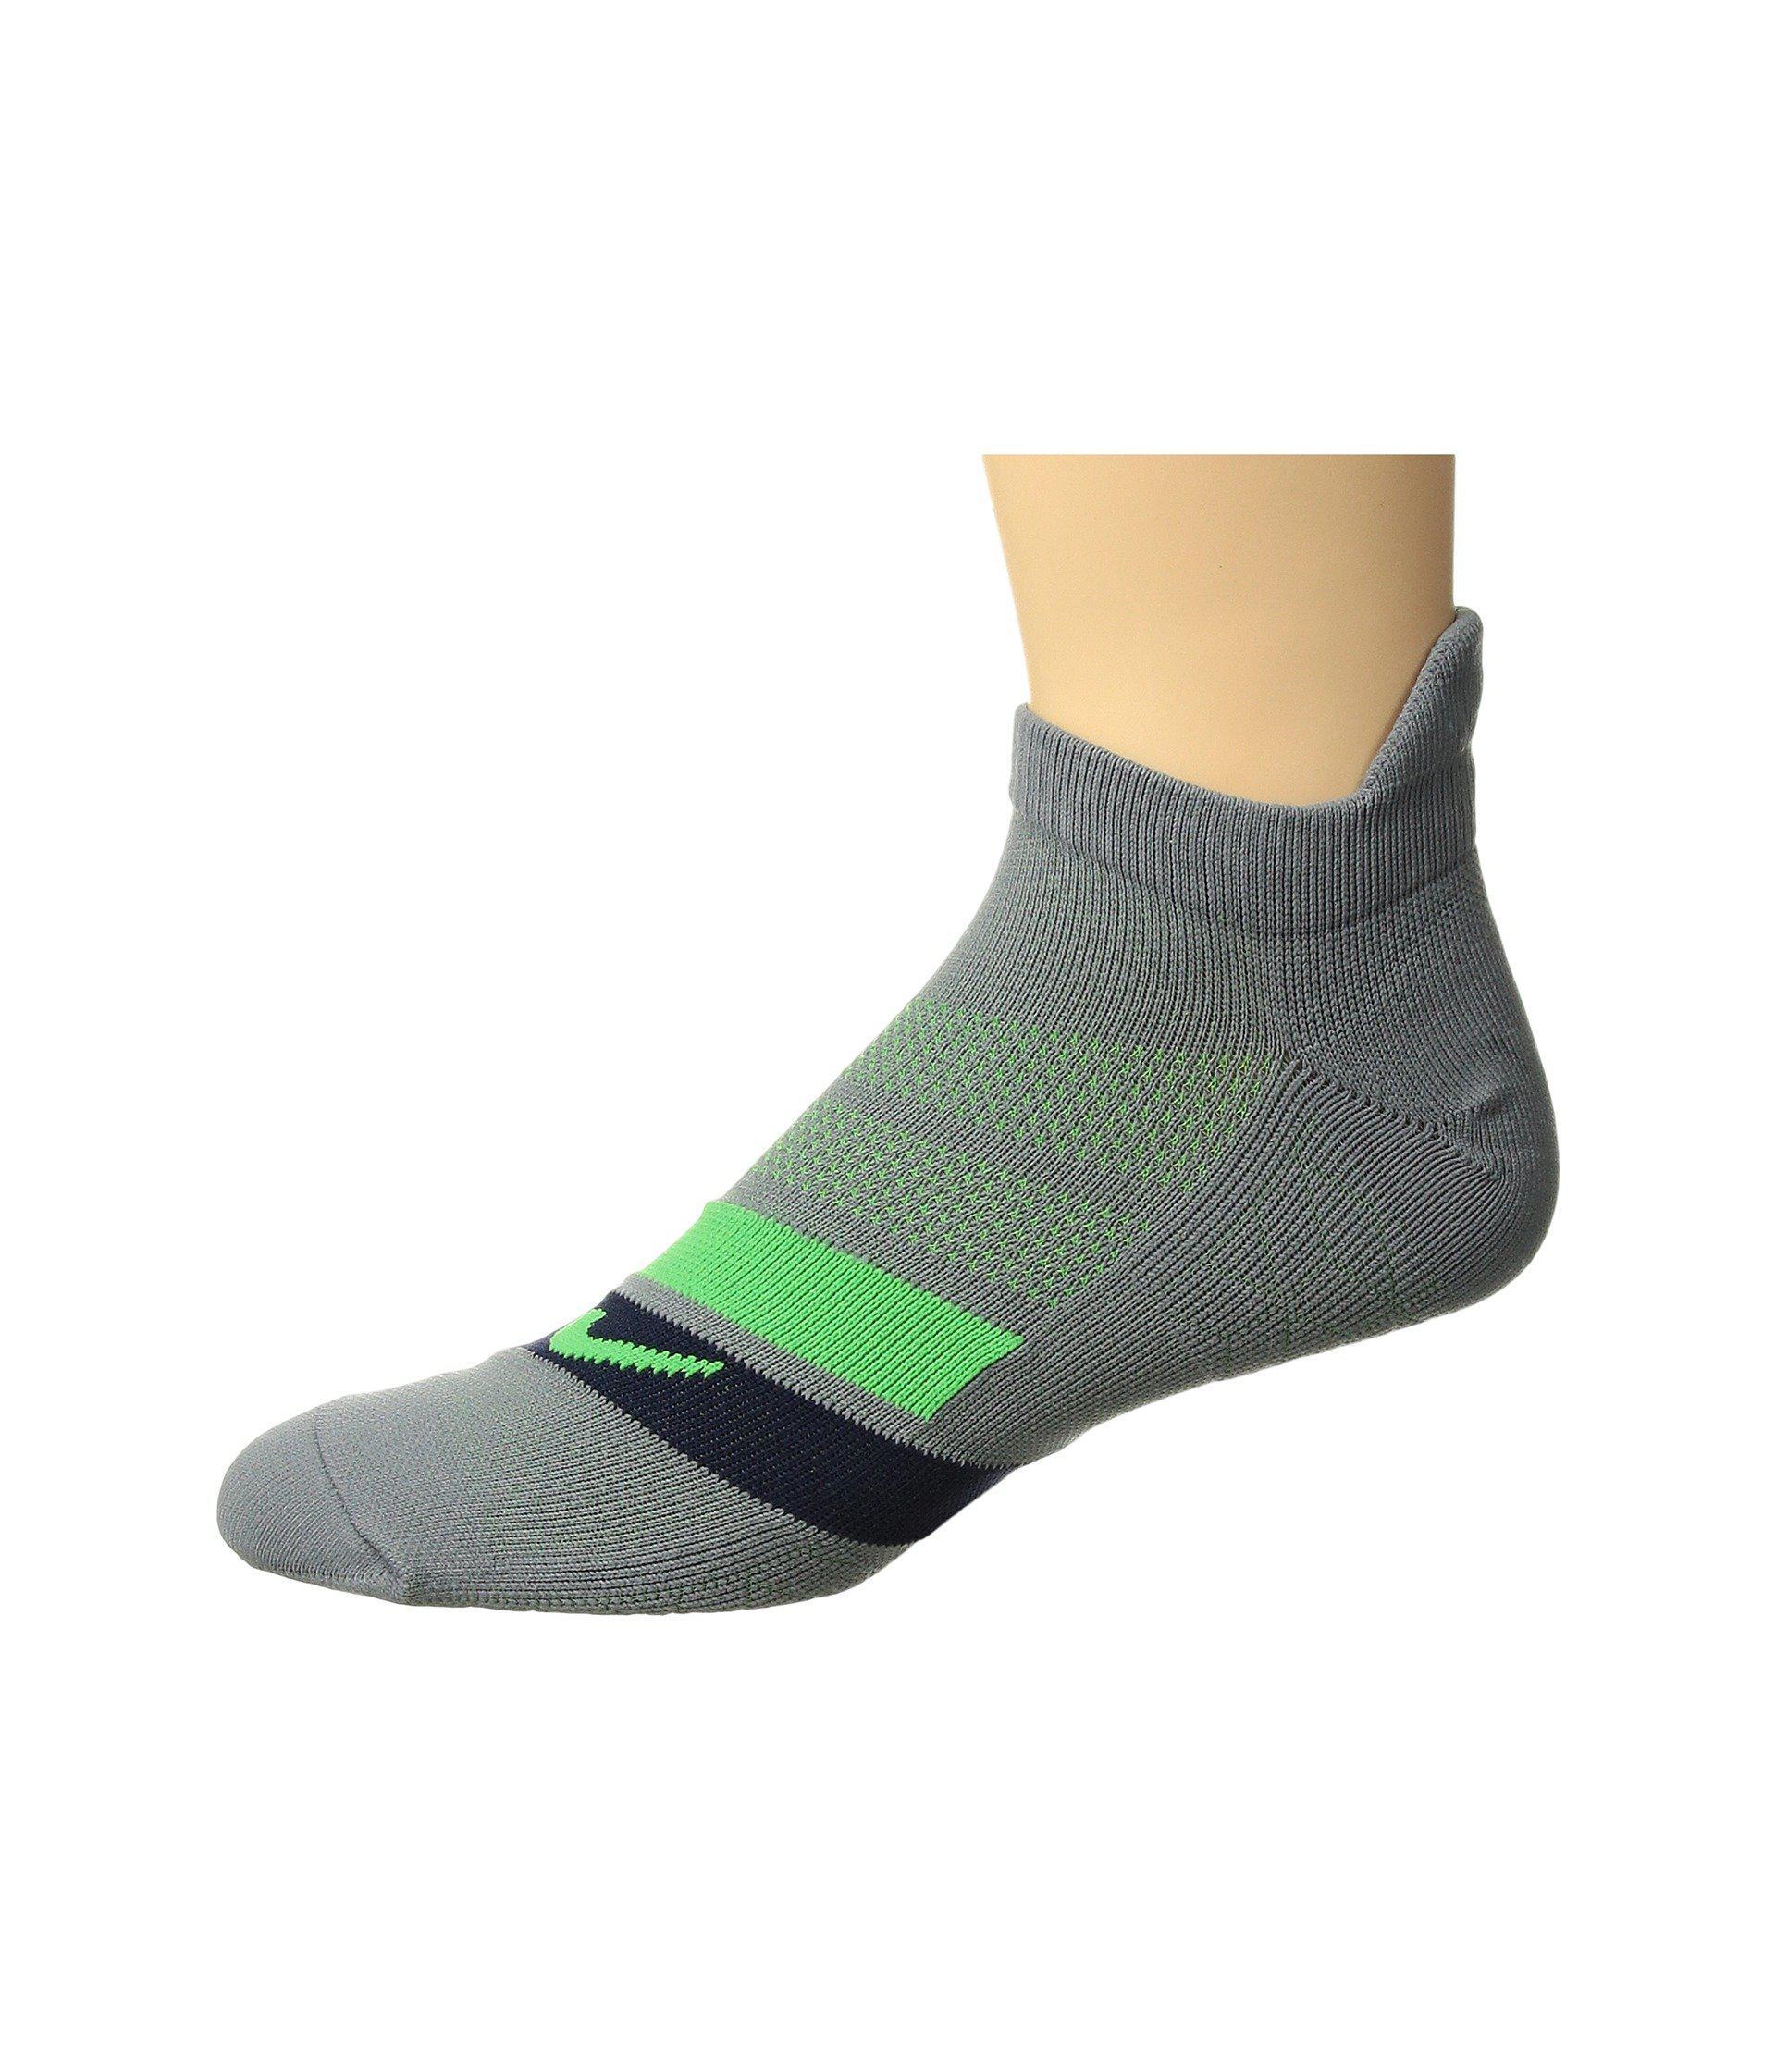 best cheap e4f83 a1c78 Lyst - Nike Dri-fit Cushion Dynamic Arch No-show Running Socks in ...